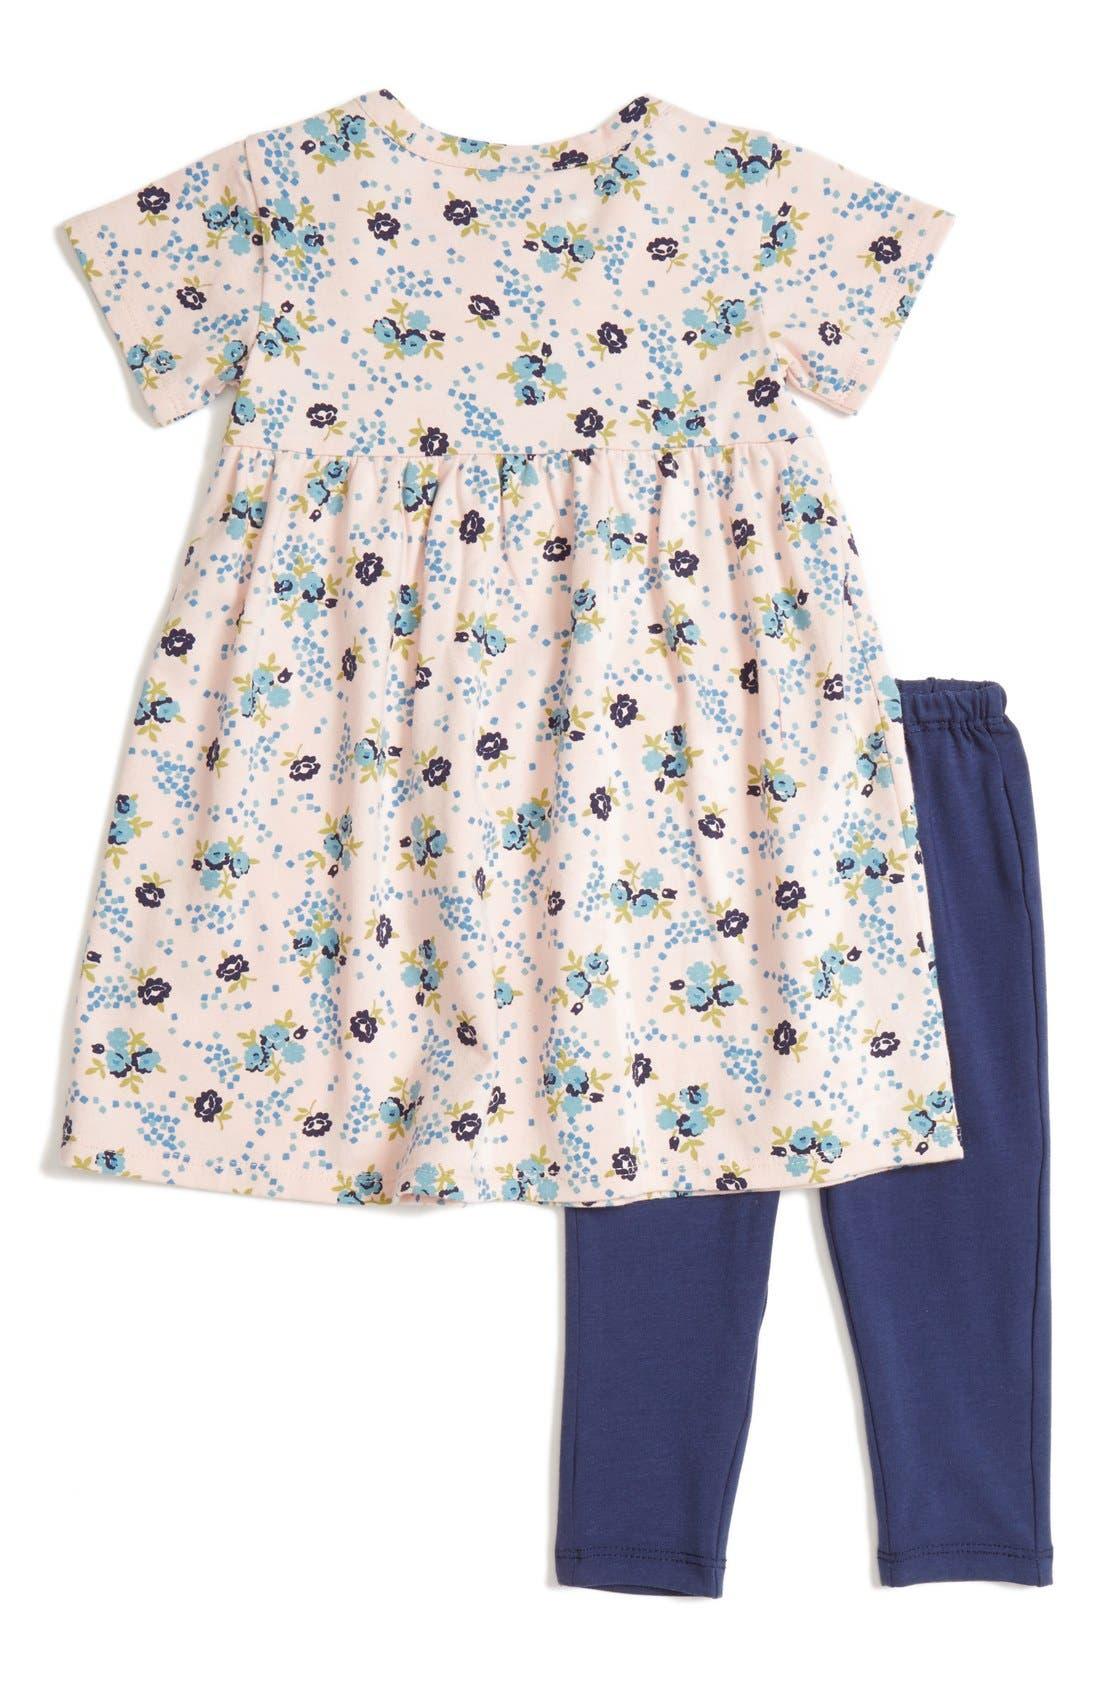 Alternate Image 2  - Tucker + Tate Floral Print Dress & Leggings Set (Baby Girls)